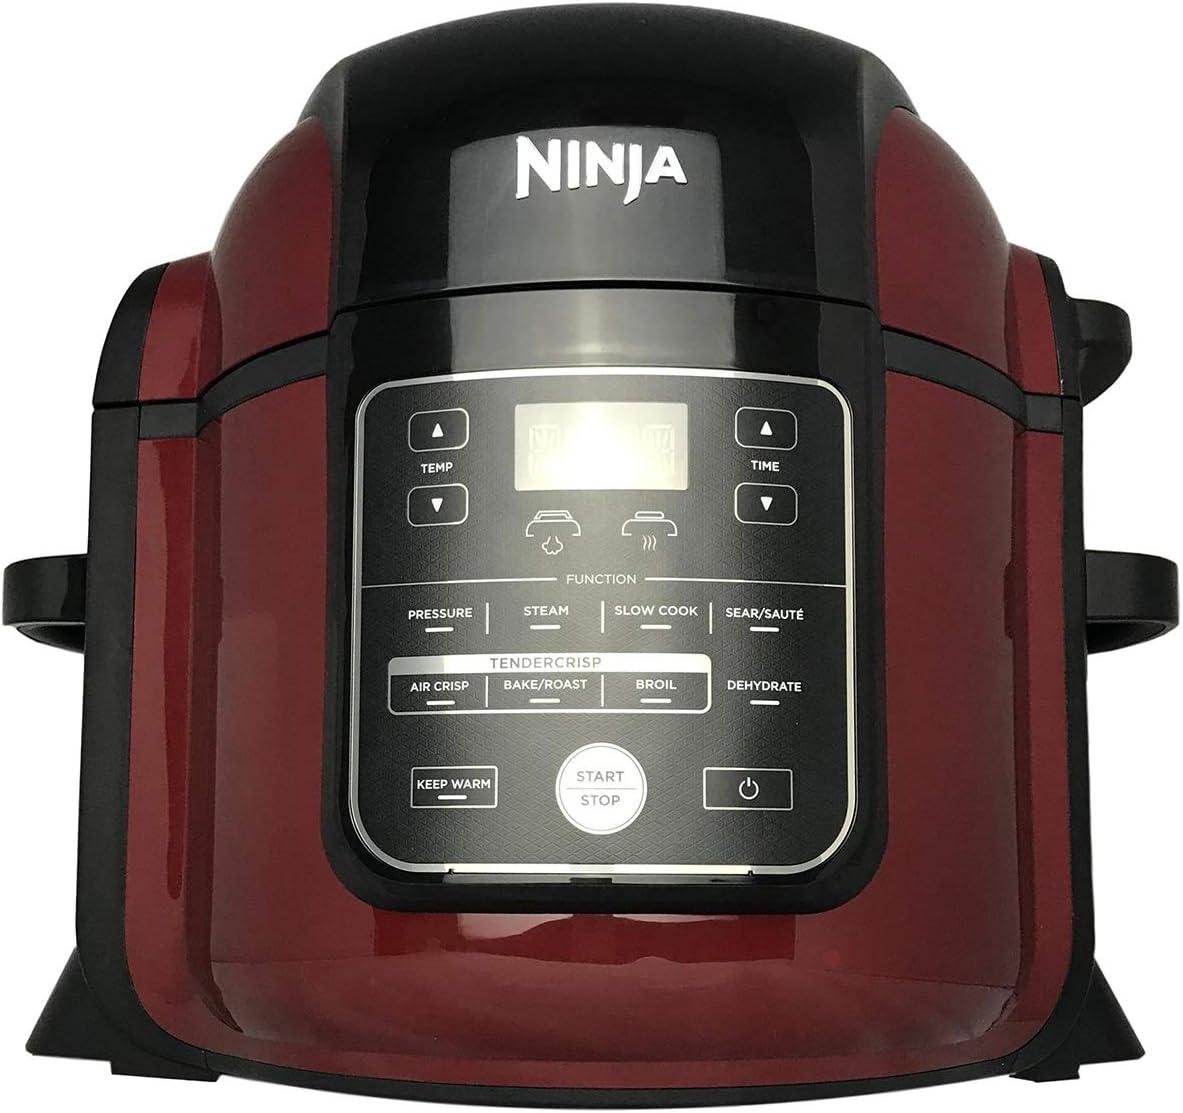 Ninja Foodi Pressure Cooker TenderCrisp Technology 8- Quart Pot Capacity Air Crisp Sear Sauté Bake Broil Steam Slow Cook Dehydrate All in One OP402 (Renewed) (Cinnamon)